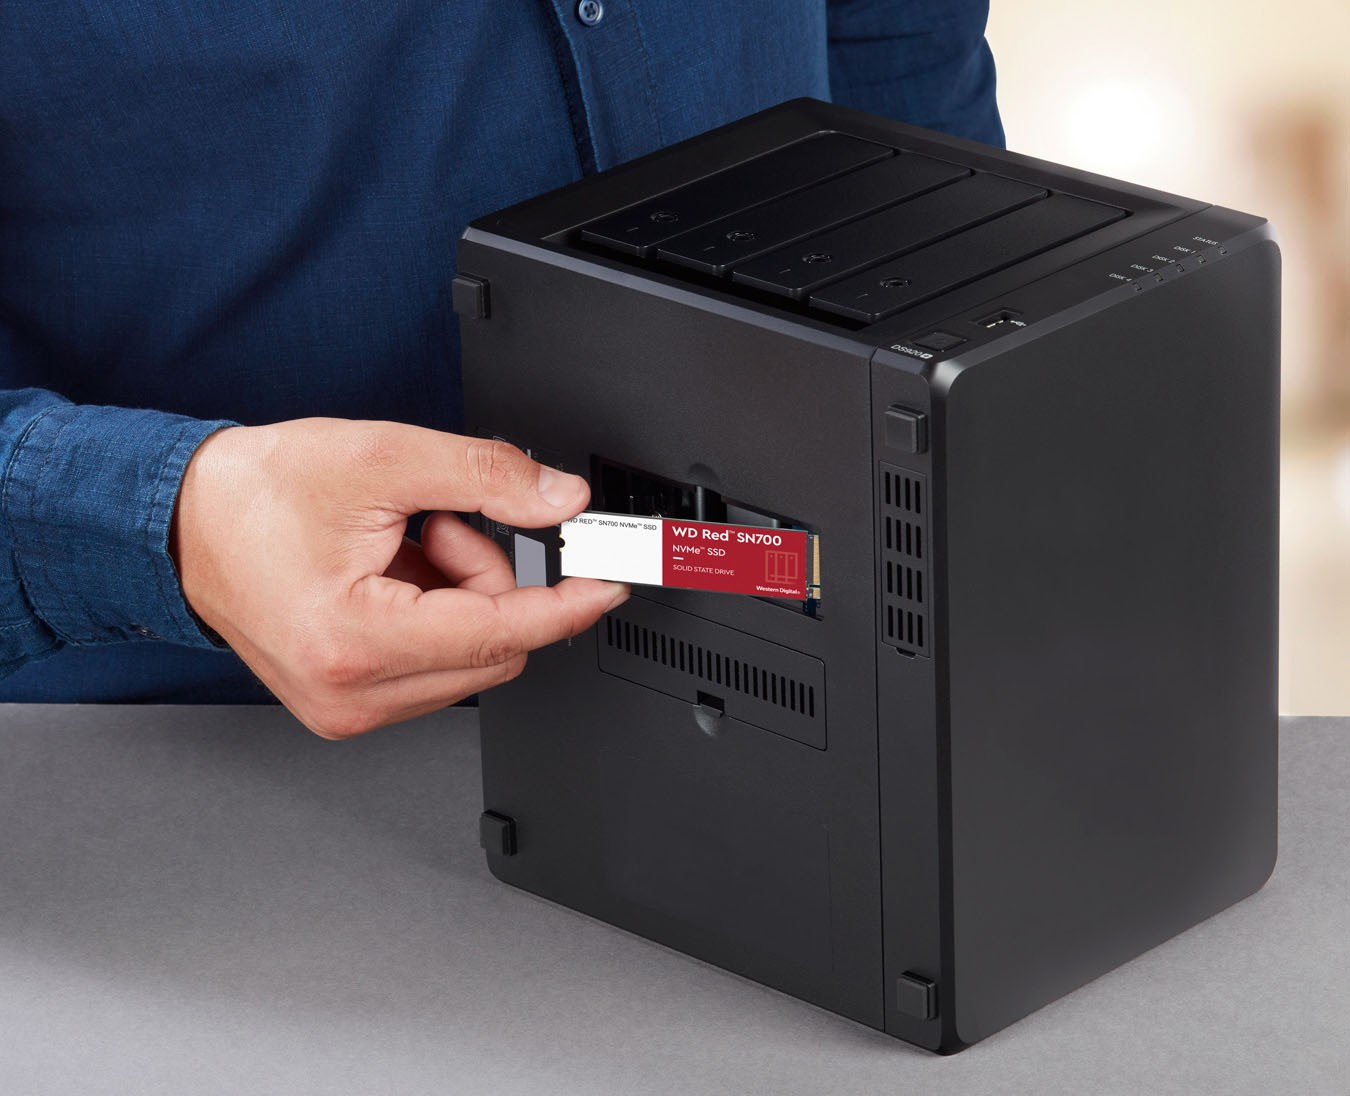 SSD M.2 NVMe TLC WD Red SN700